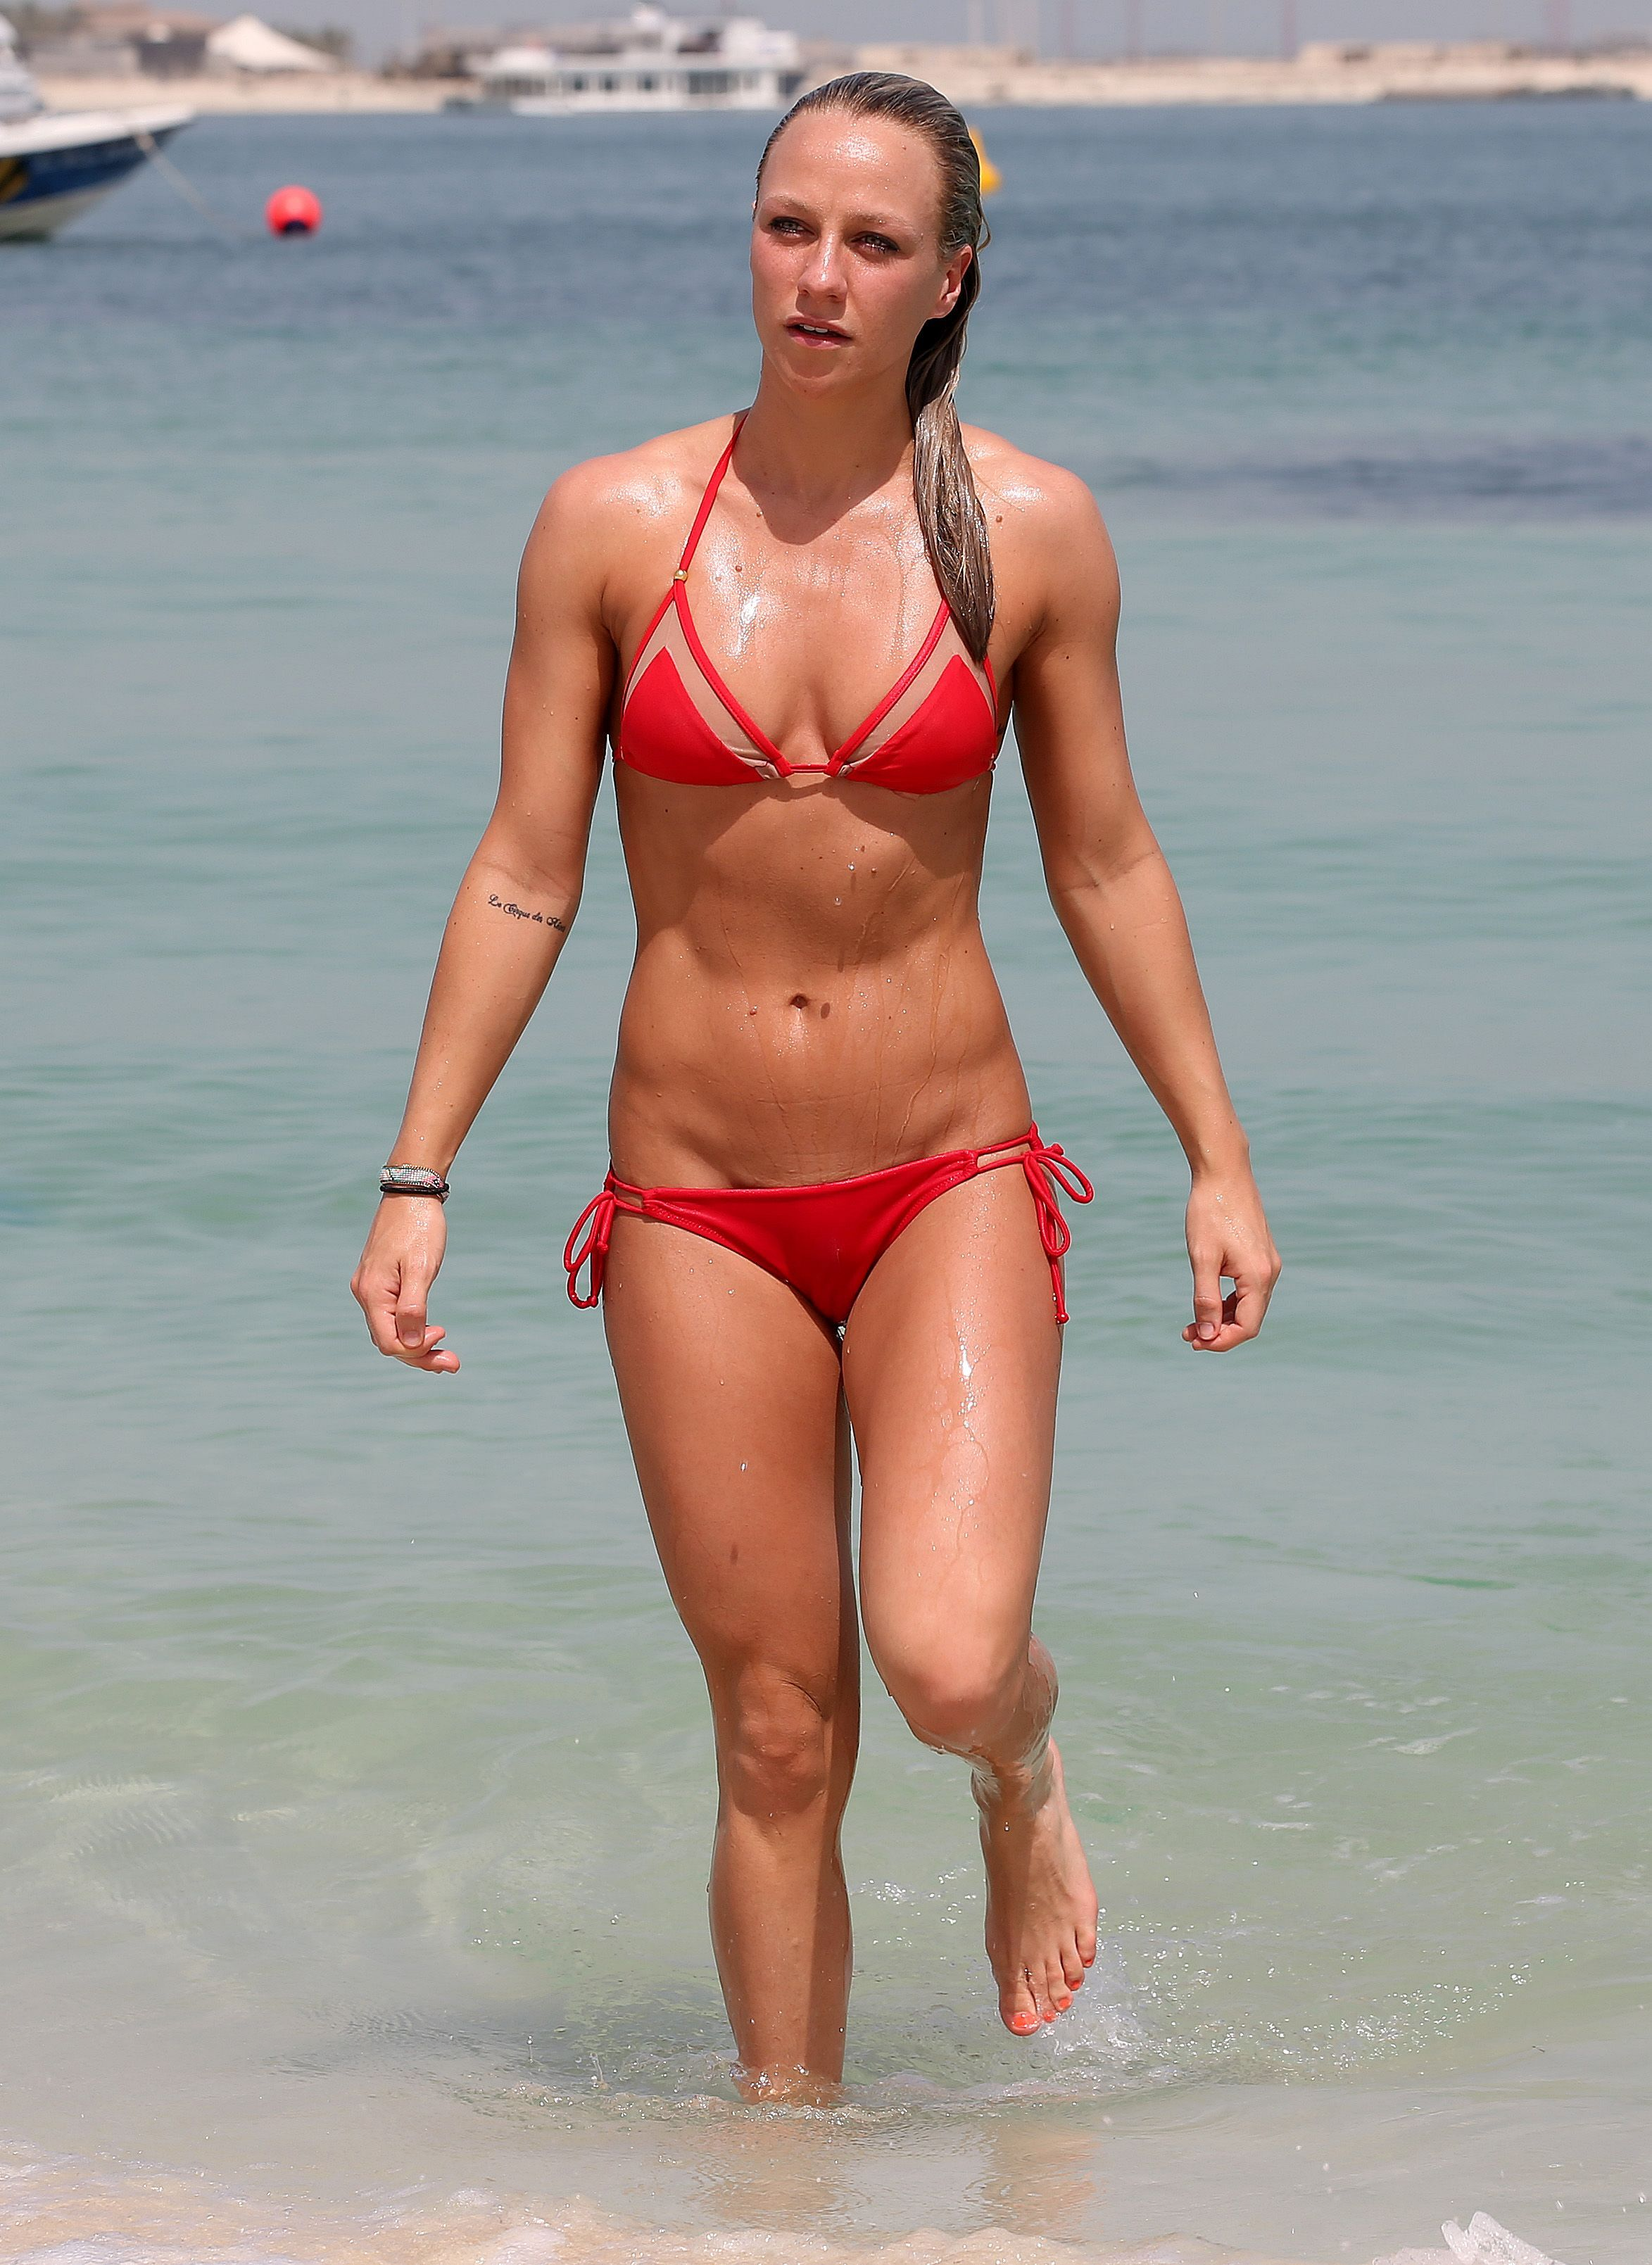 Amanda brazil blanco y negro - 2 2